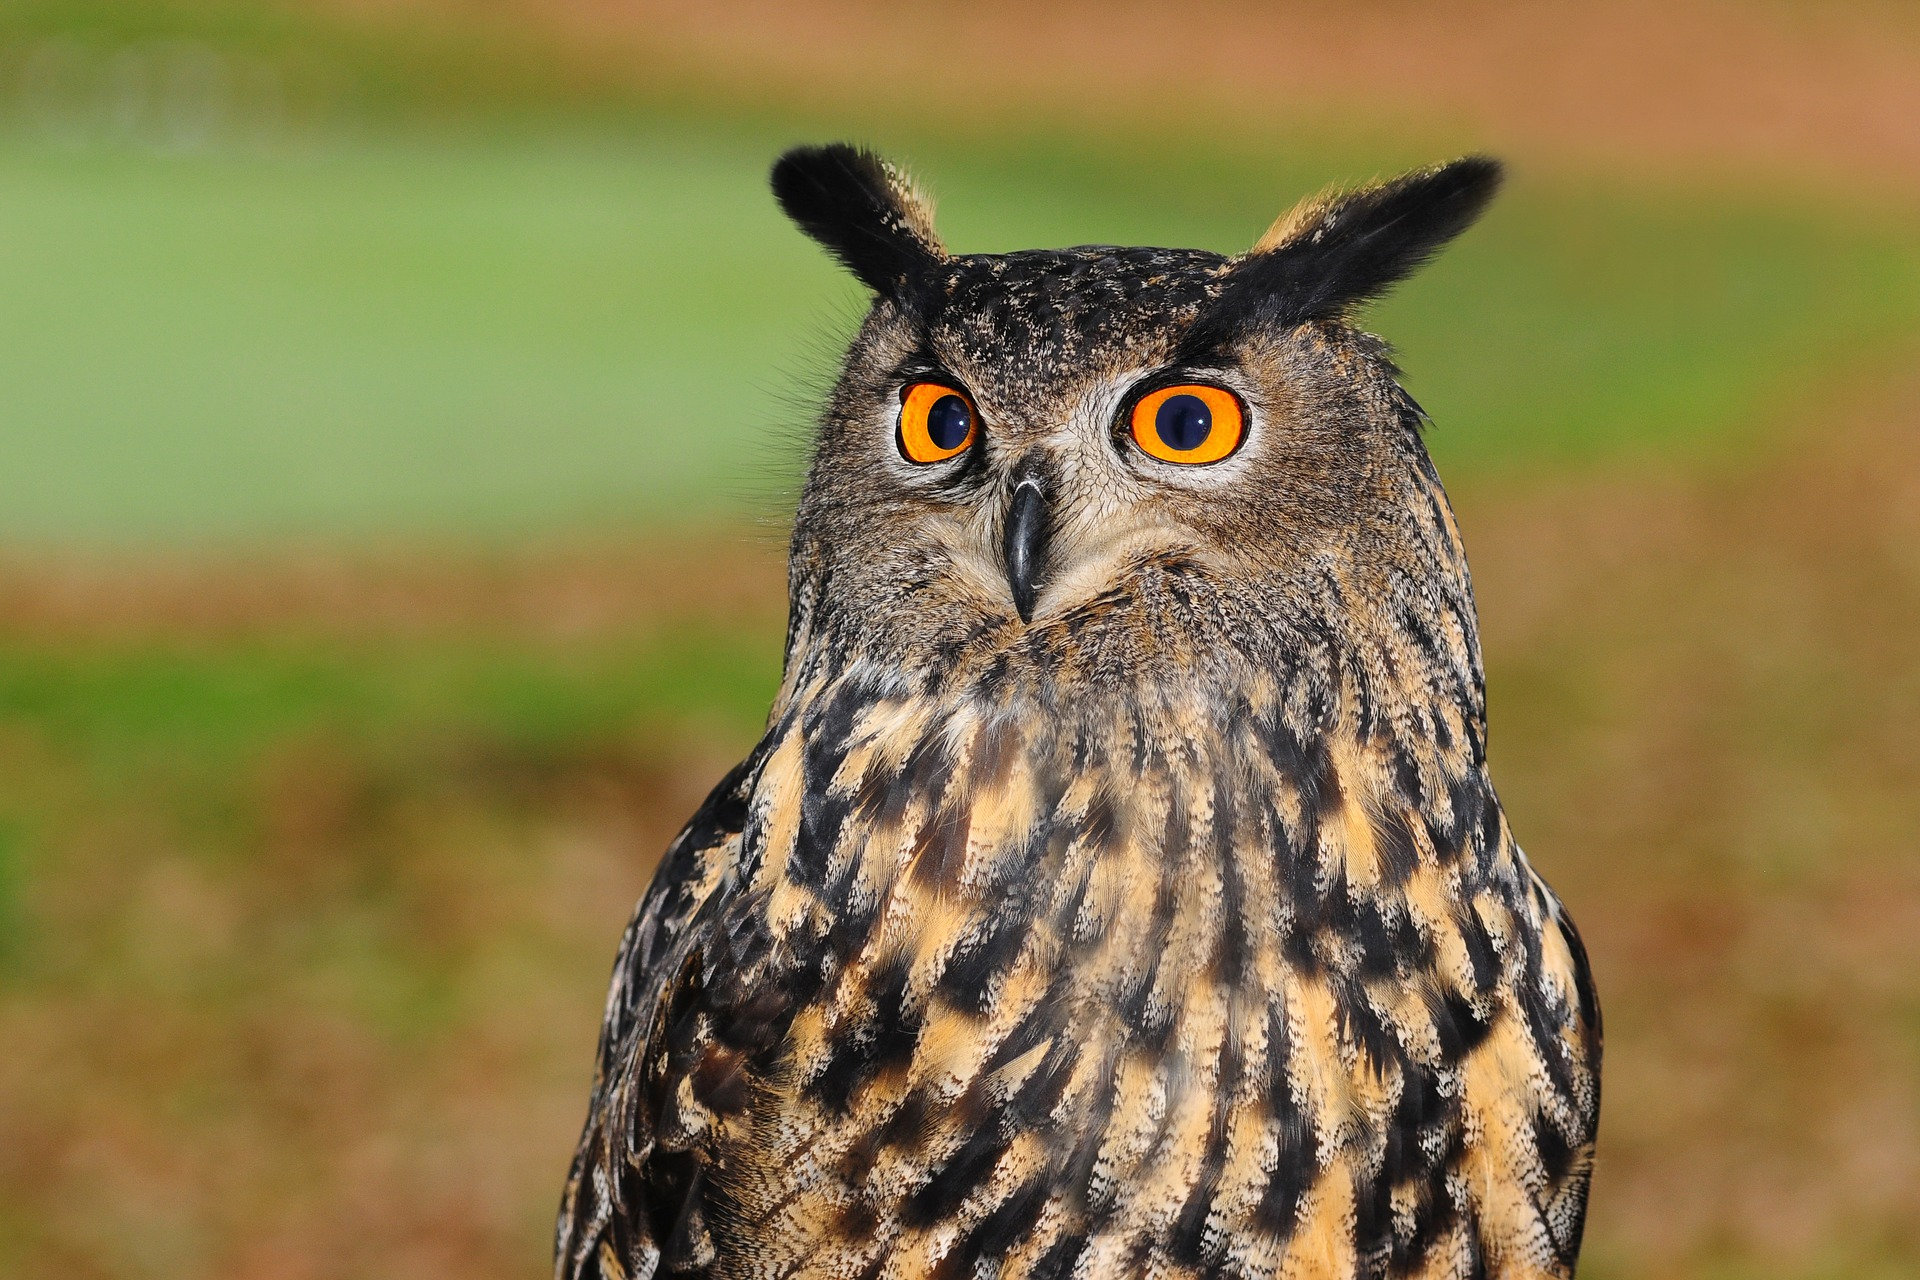 european-eagle-owl-2010346_1920.jpg